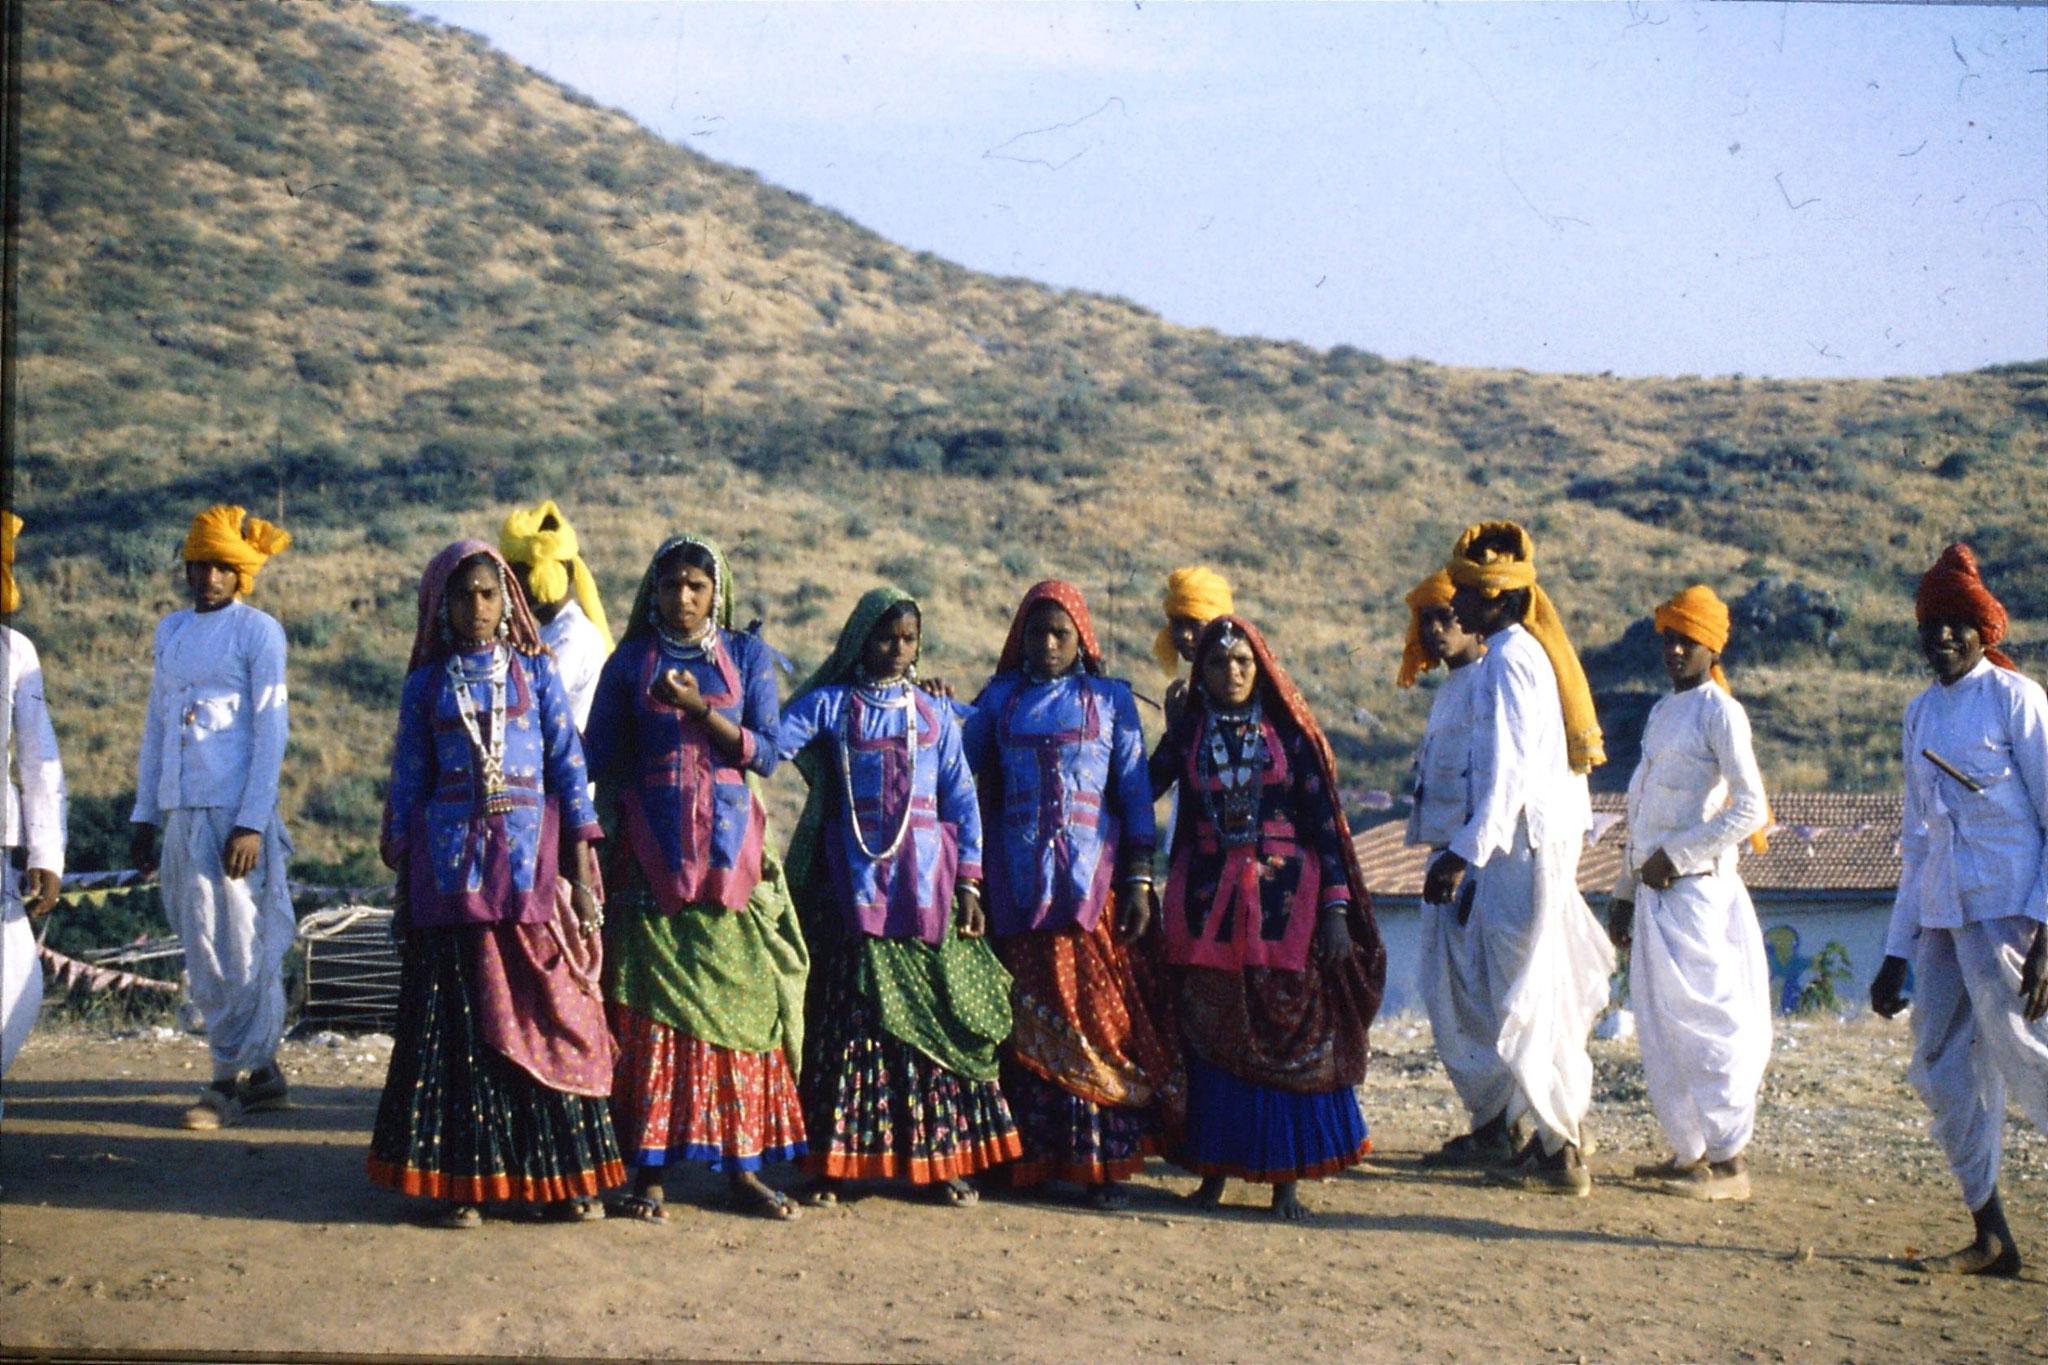 8/12/1989: 25: Udaipur Shilp Gram Craft Centre dancing